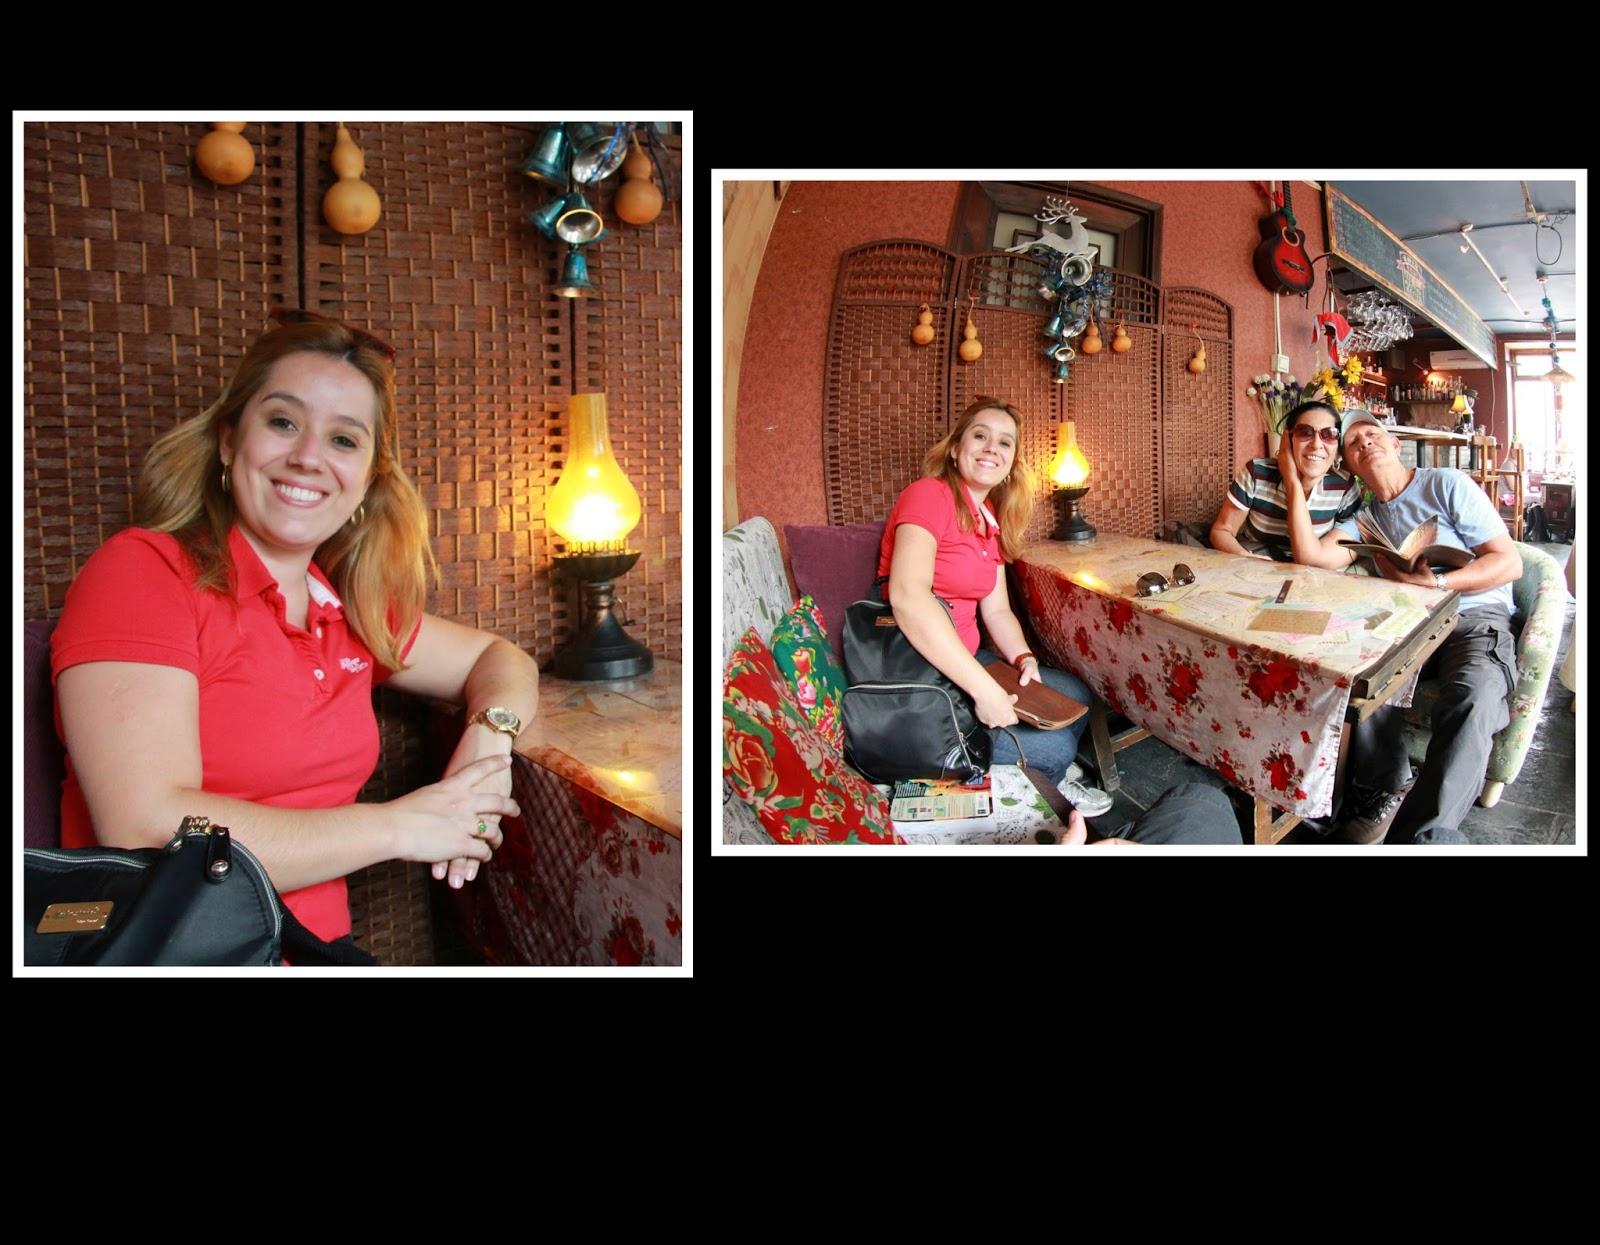 Restaurante no H utong Nanluogu Xiang #BB1027 1600 1245